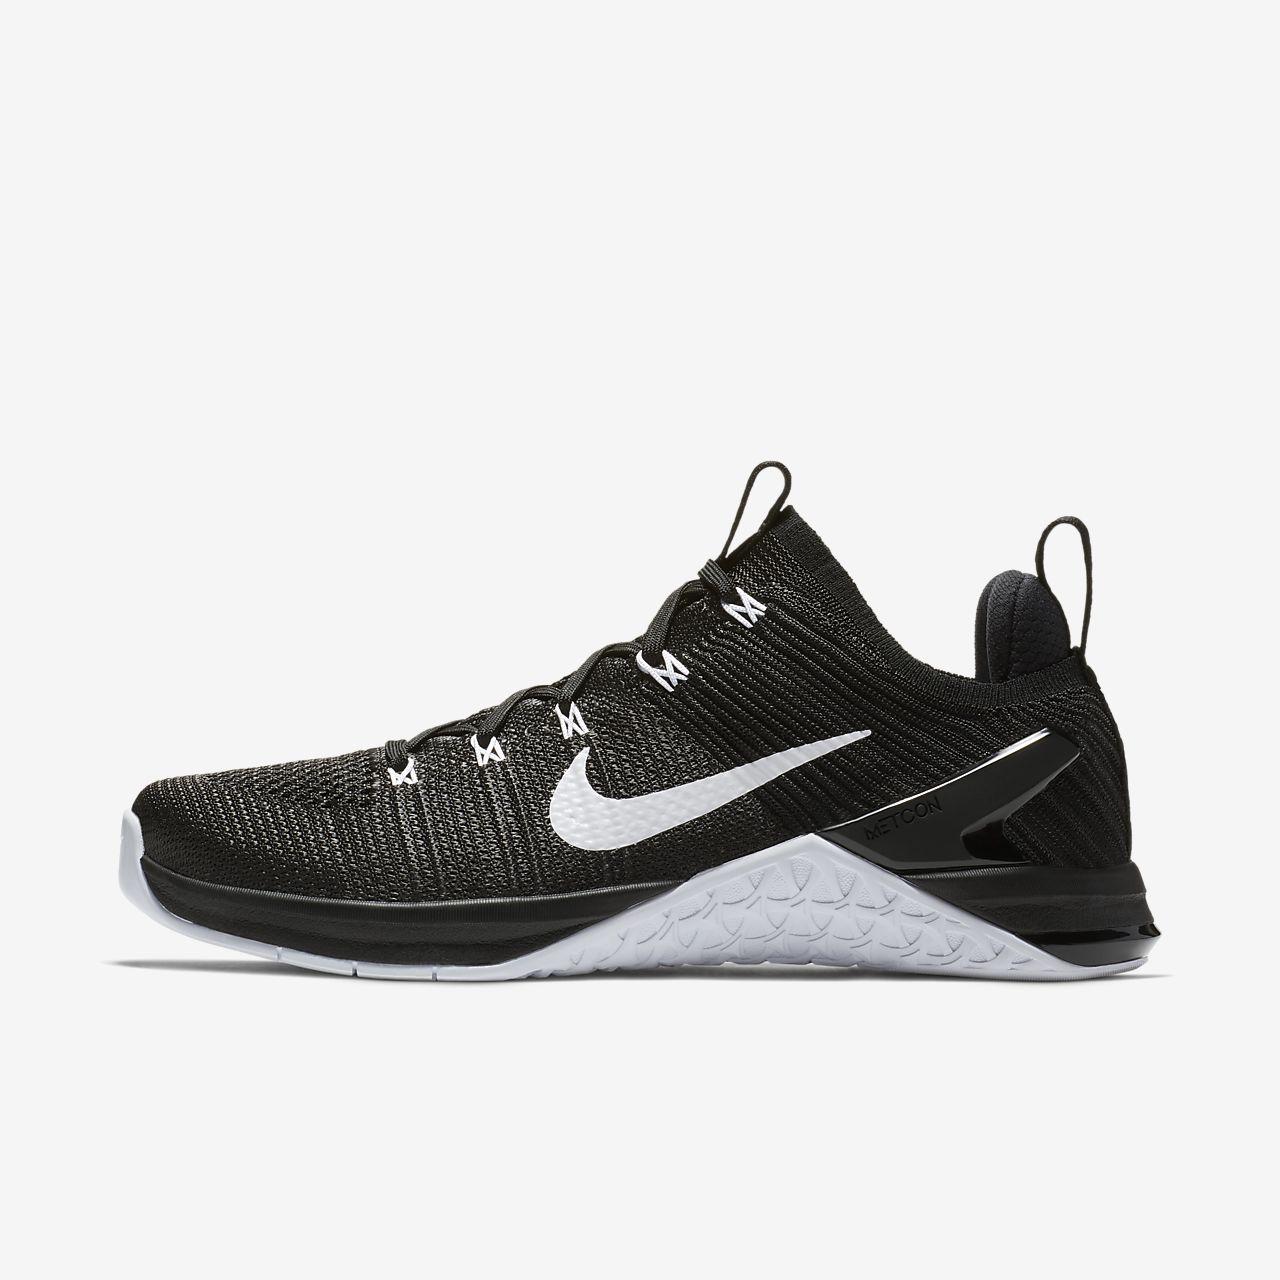 Nike Scarpa Pesi Dsx 2 Trainingsollevamento Metcon Cross Flyknit Da xrSHx